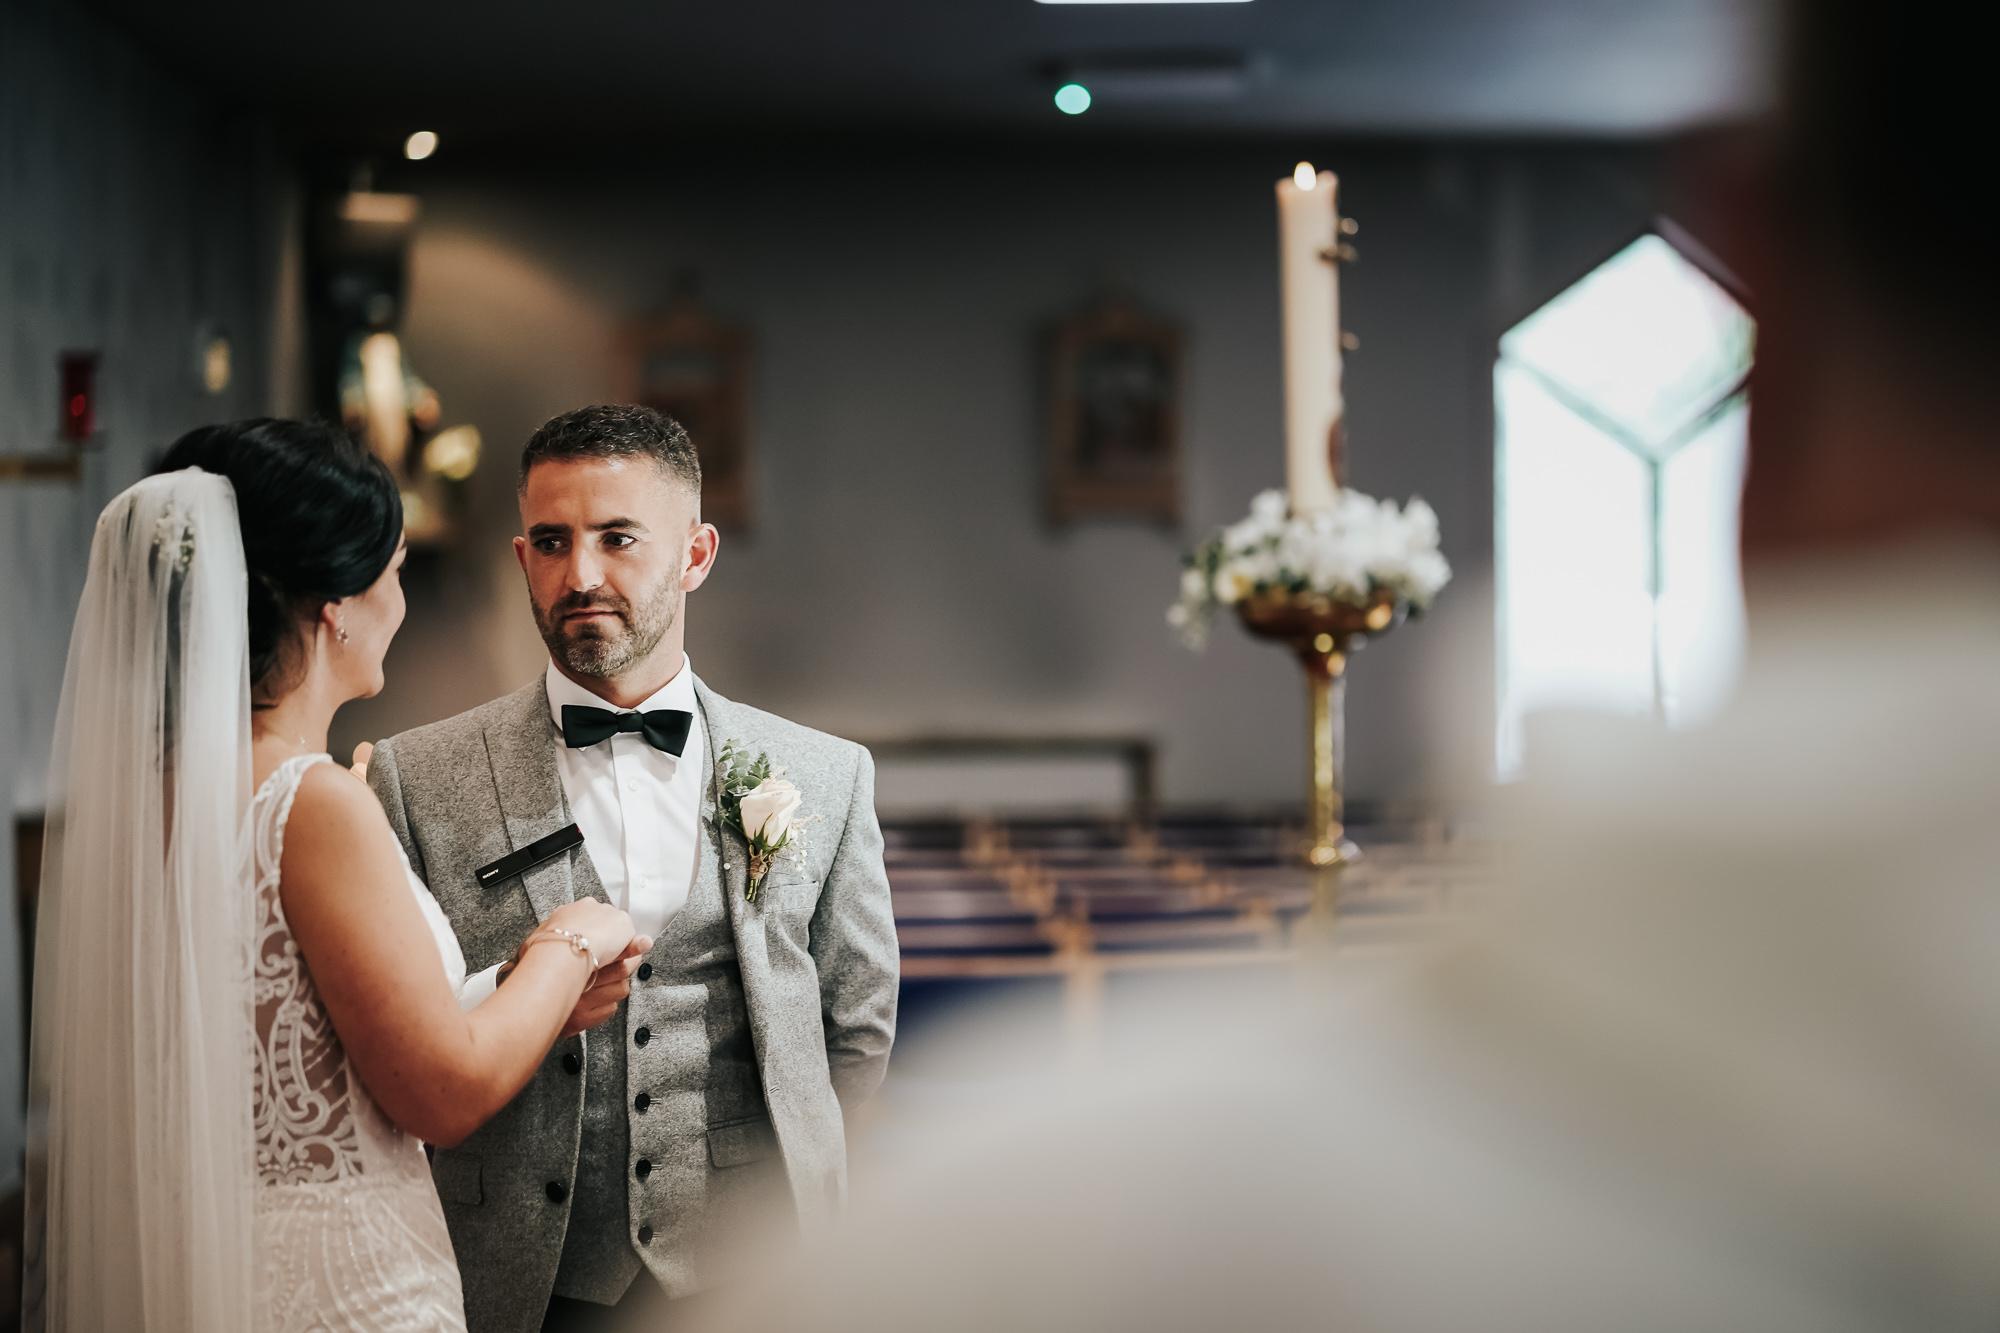 The Hayloft Wedding Photography Cheshire wedding photographer (23 of 52).jpg